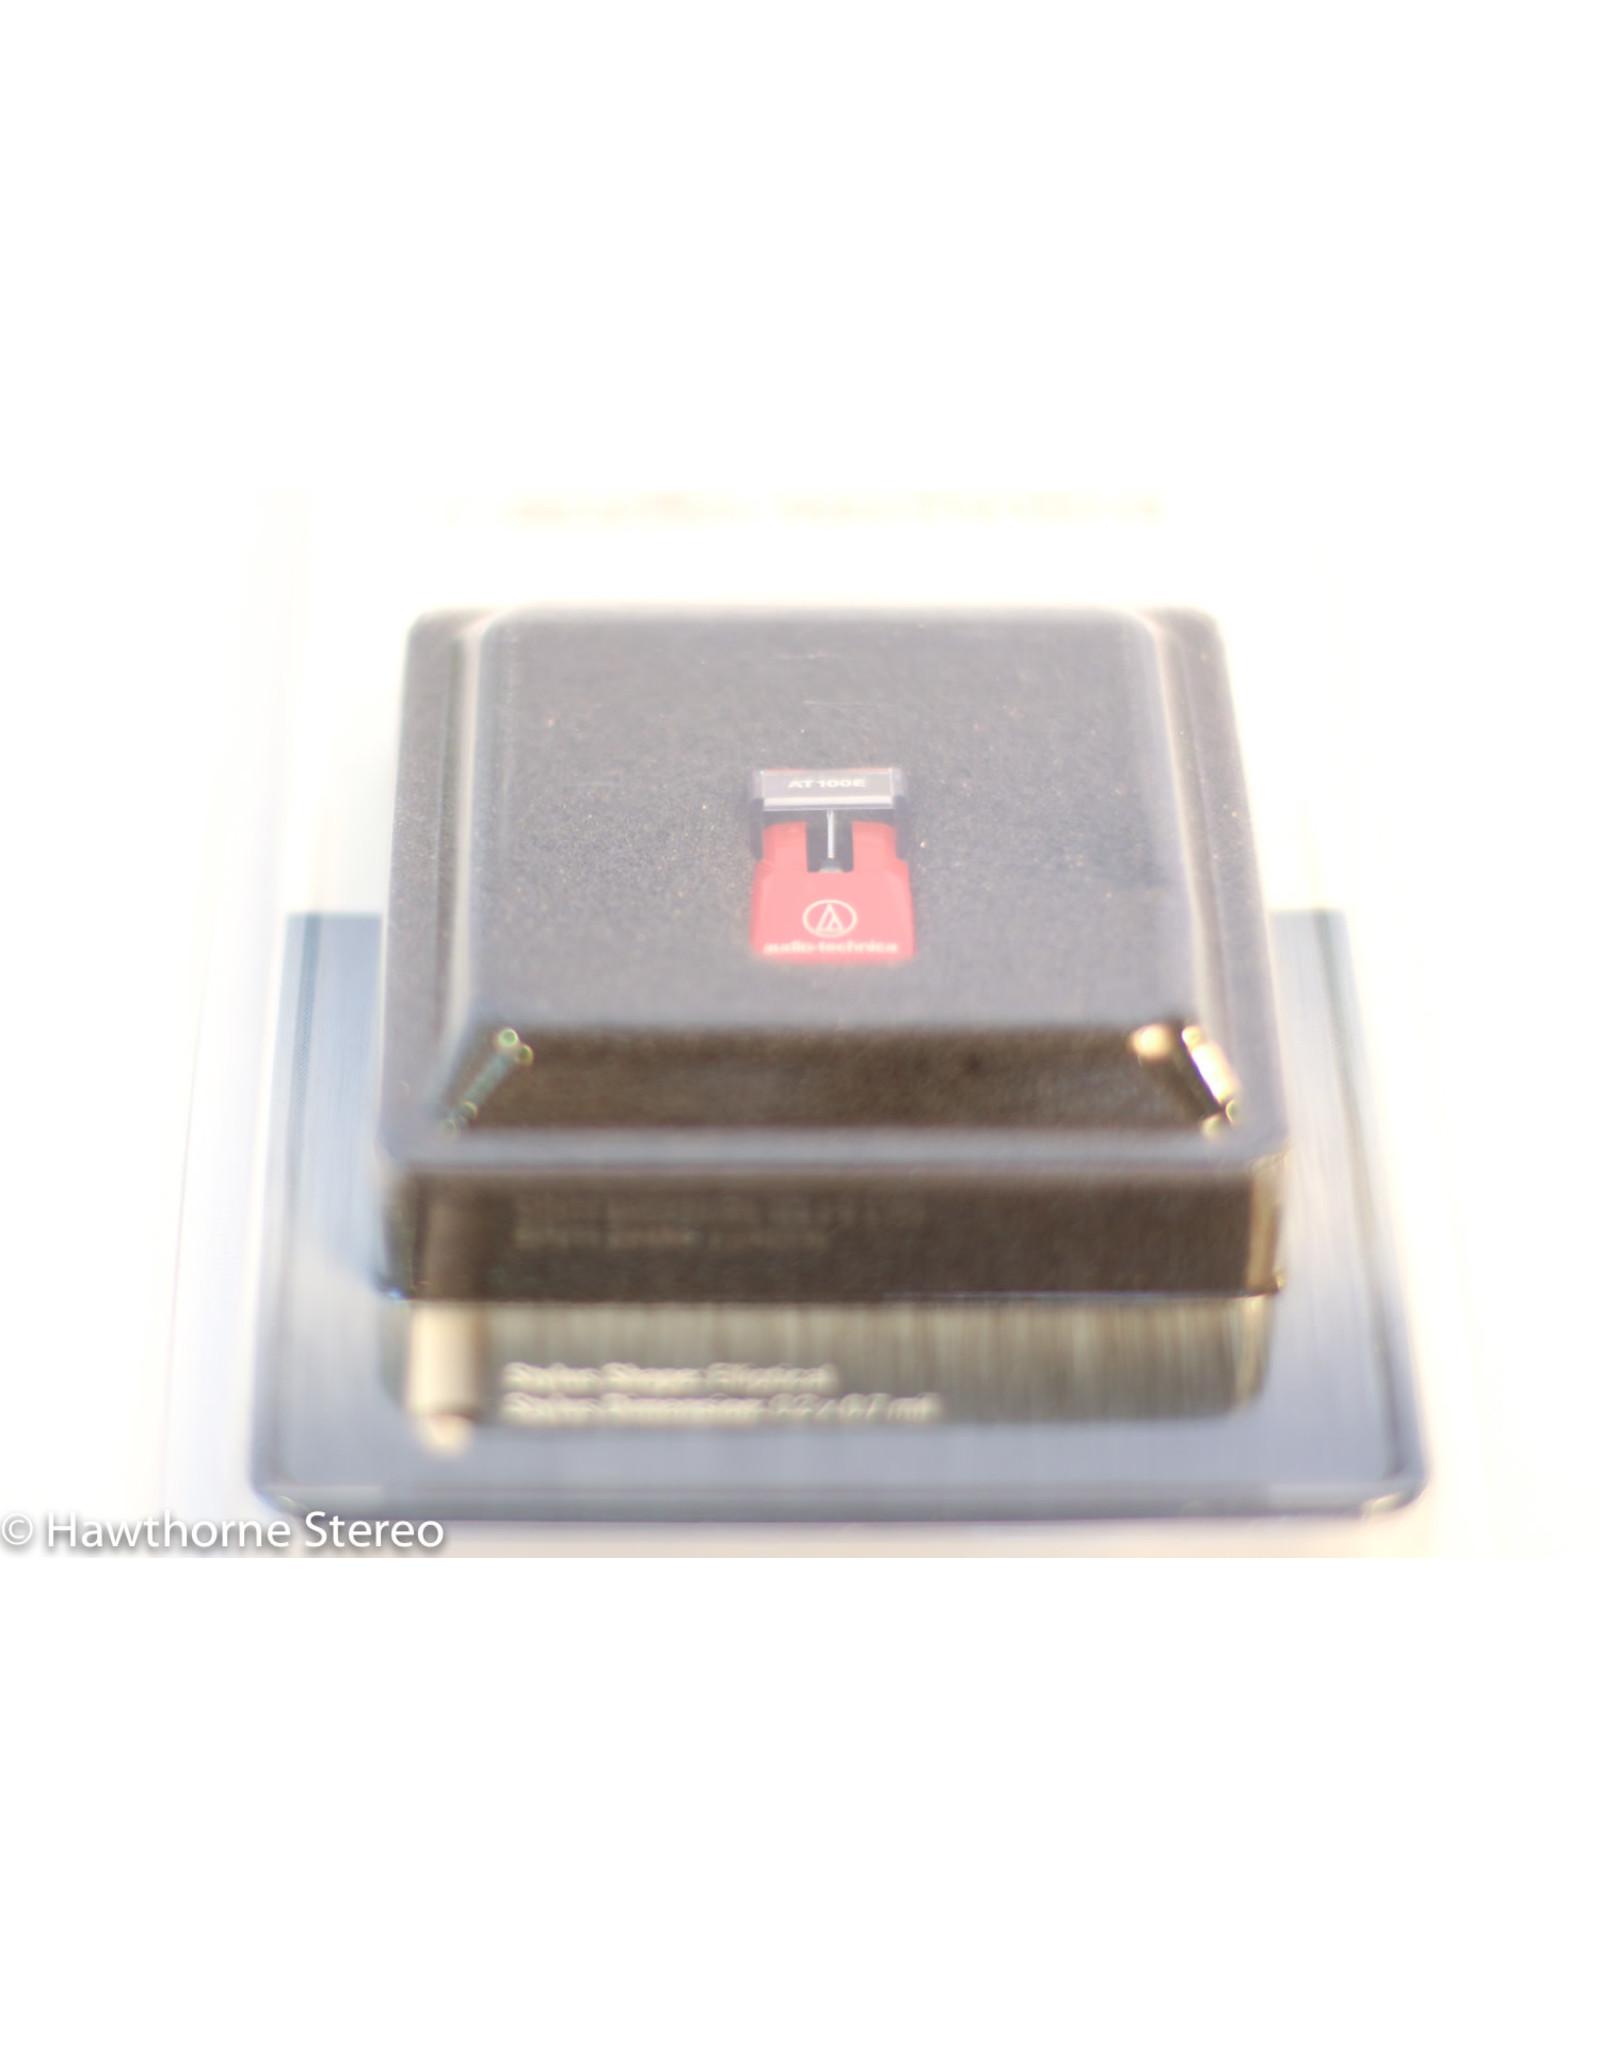 Audio-Technica Audio-Technica ATN 100E Phono Stylus USED